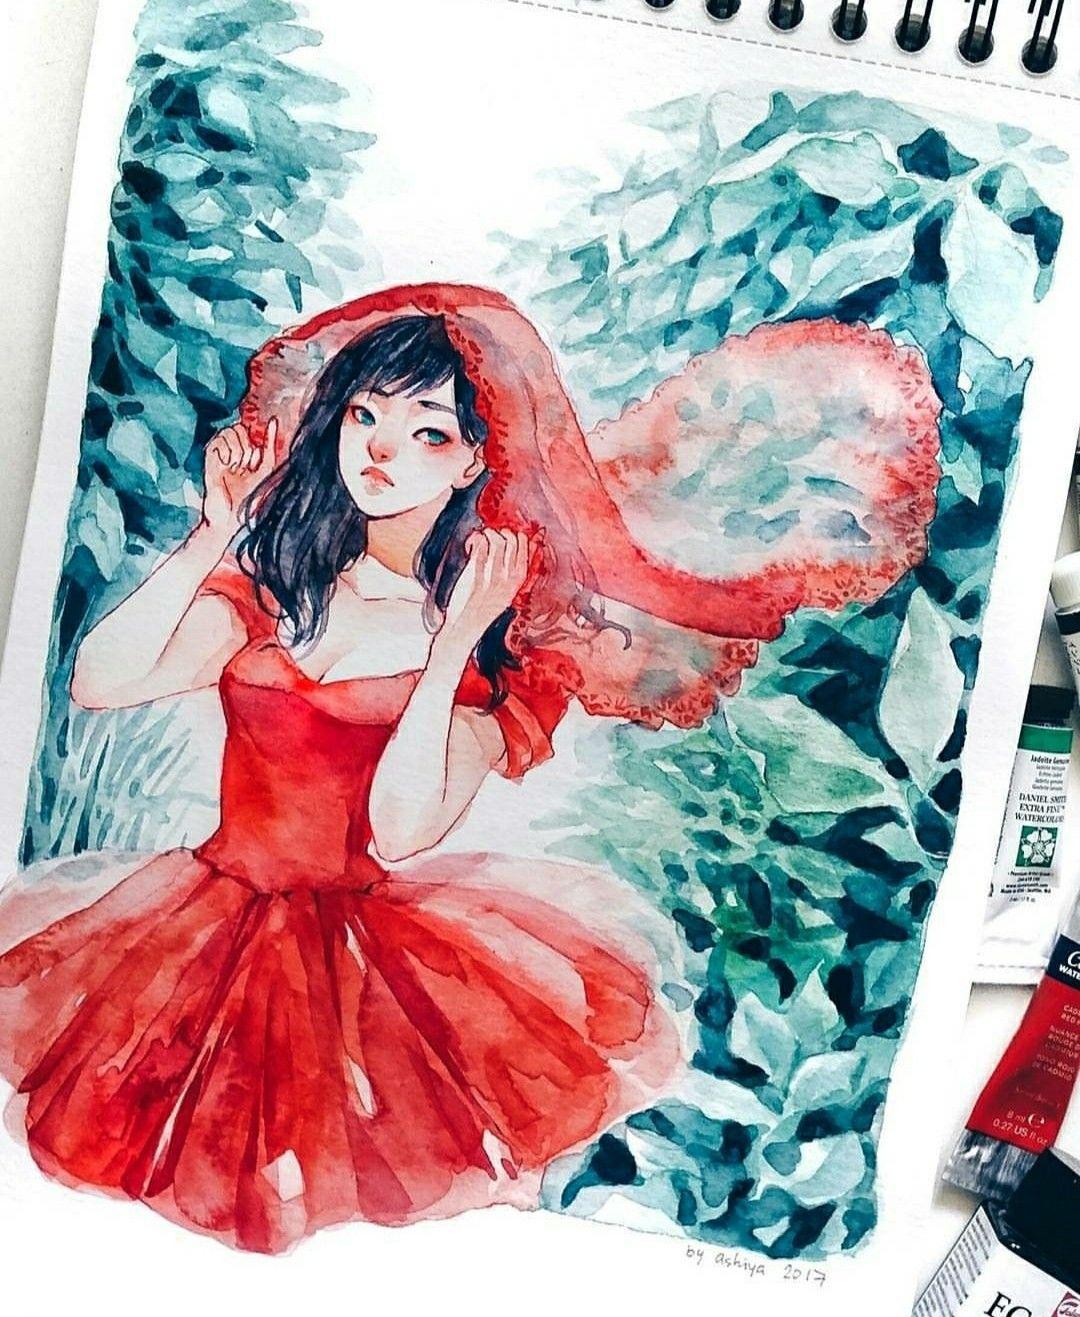 Art By Ashiyaart Dessin Aquarelle Canson